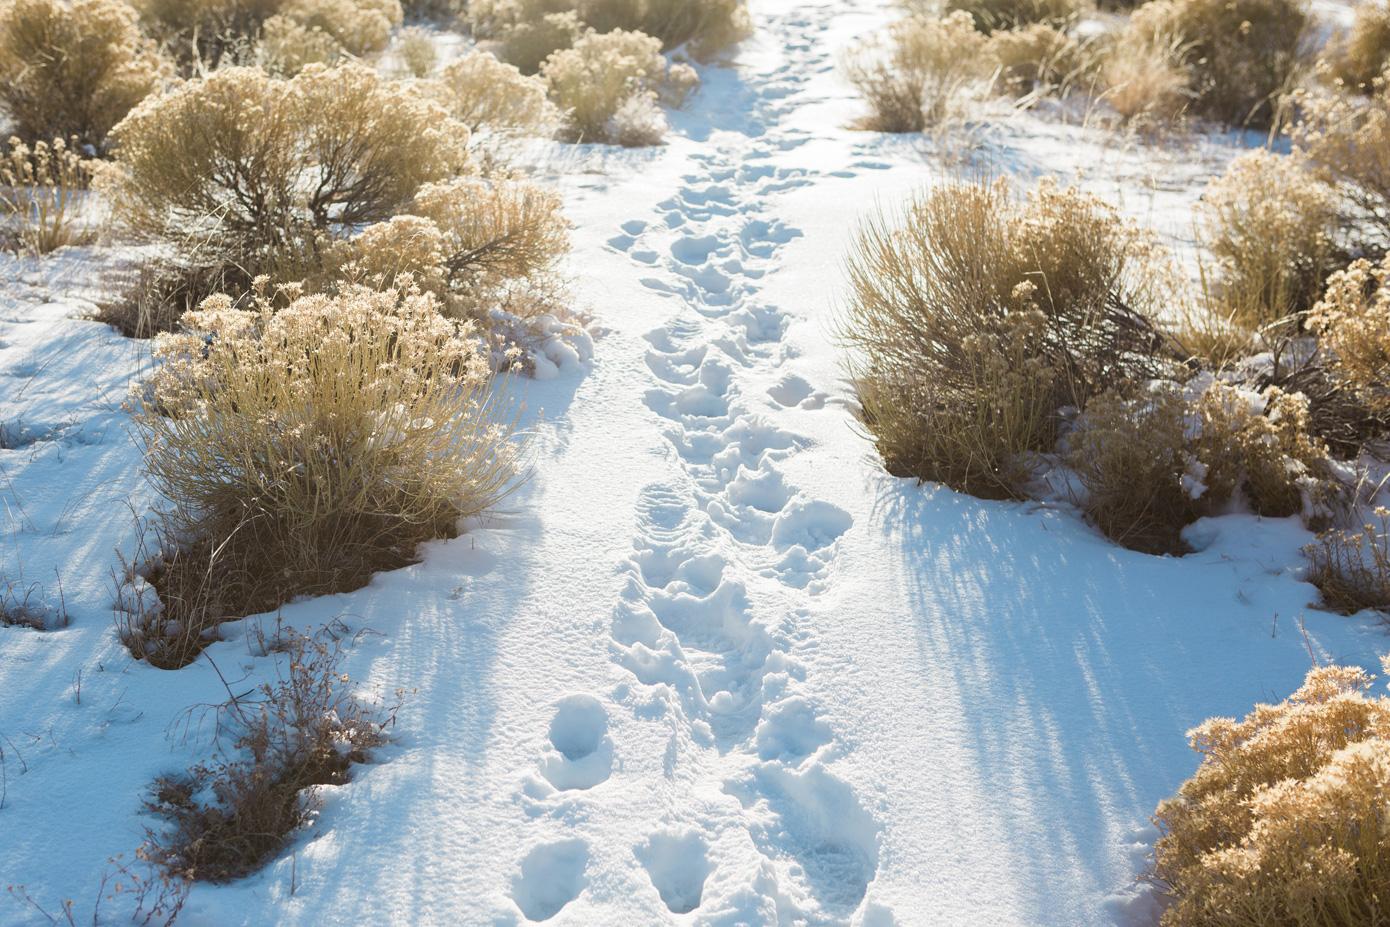 CindyGiovagnoli_Great_Sand_Dunes_National_Park_NPS_Colorado_roadtrip-010.jpg